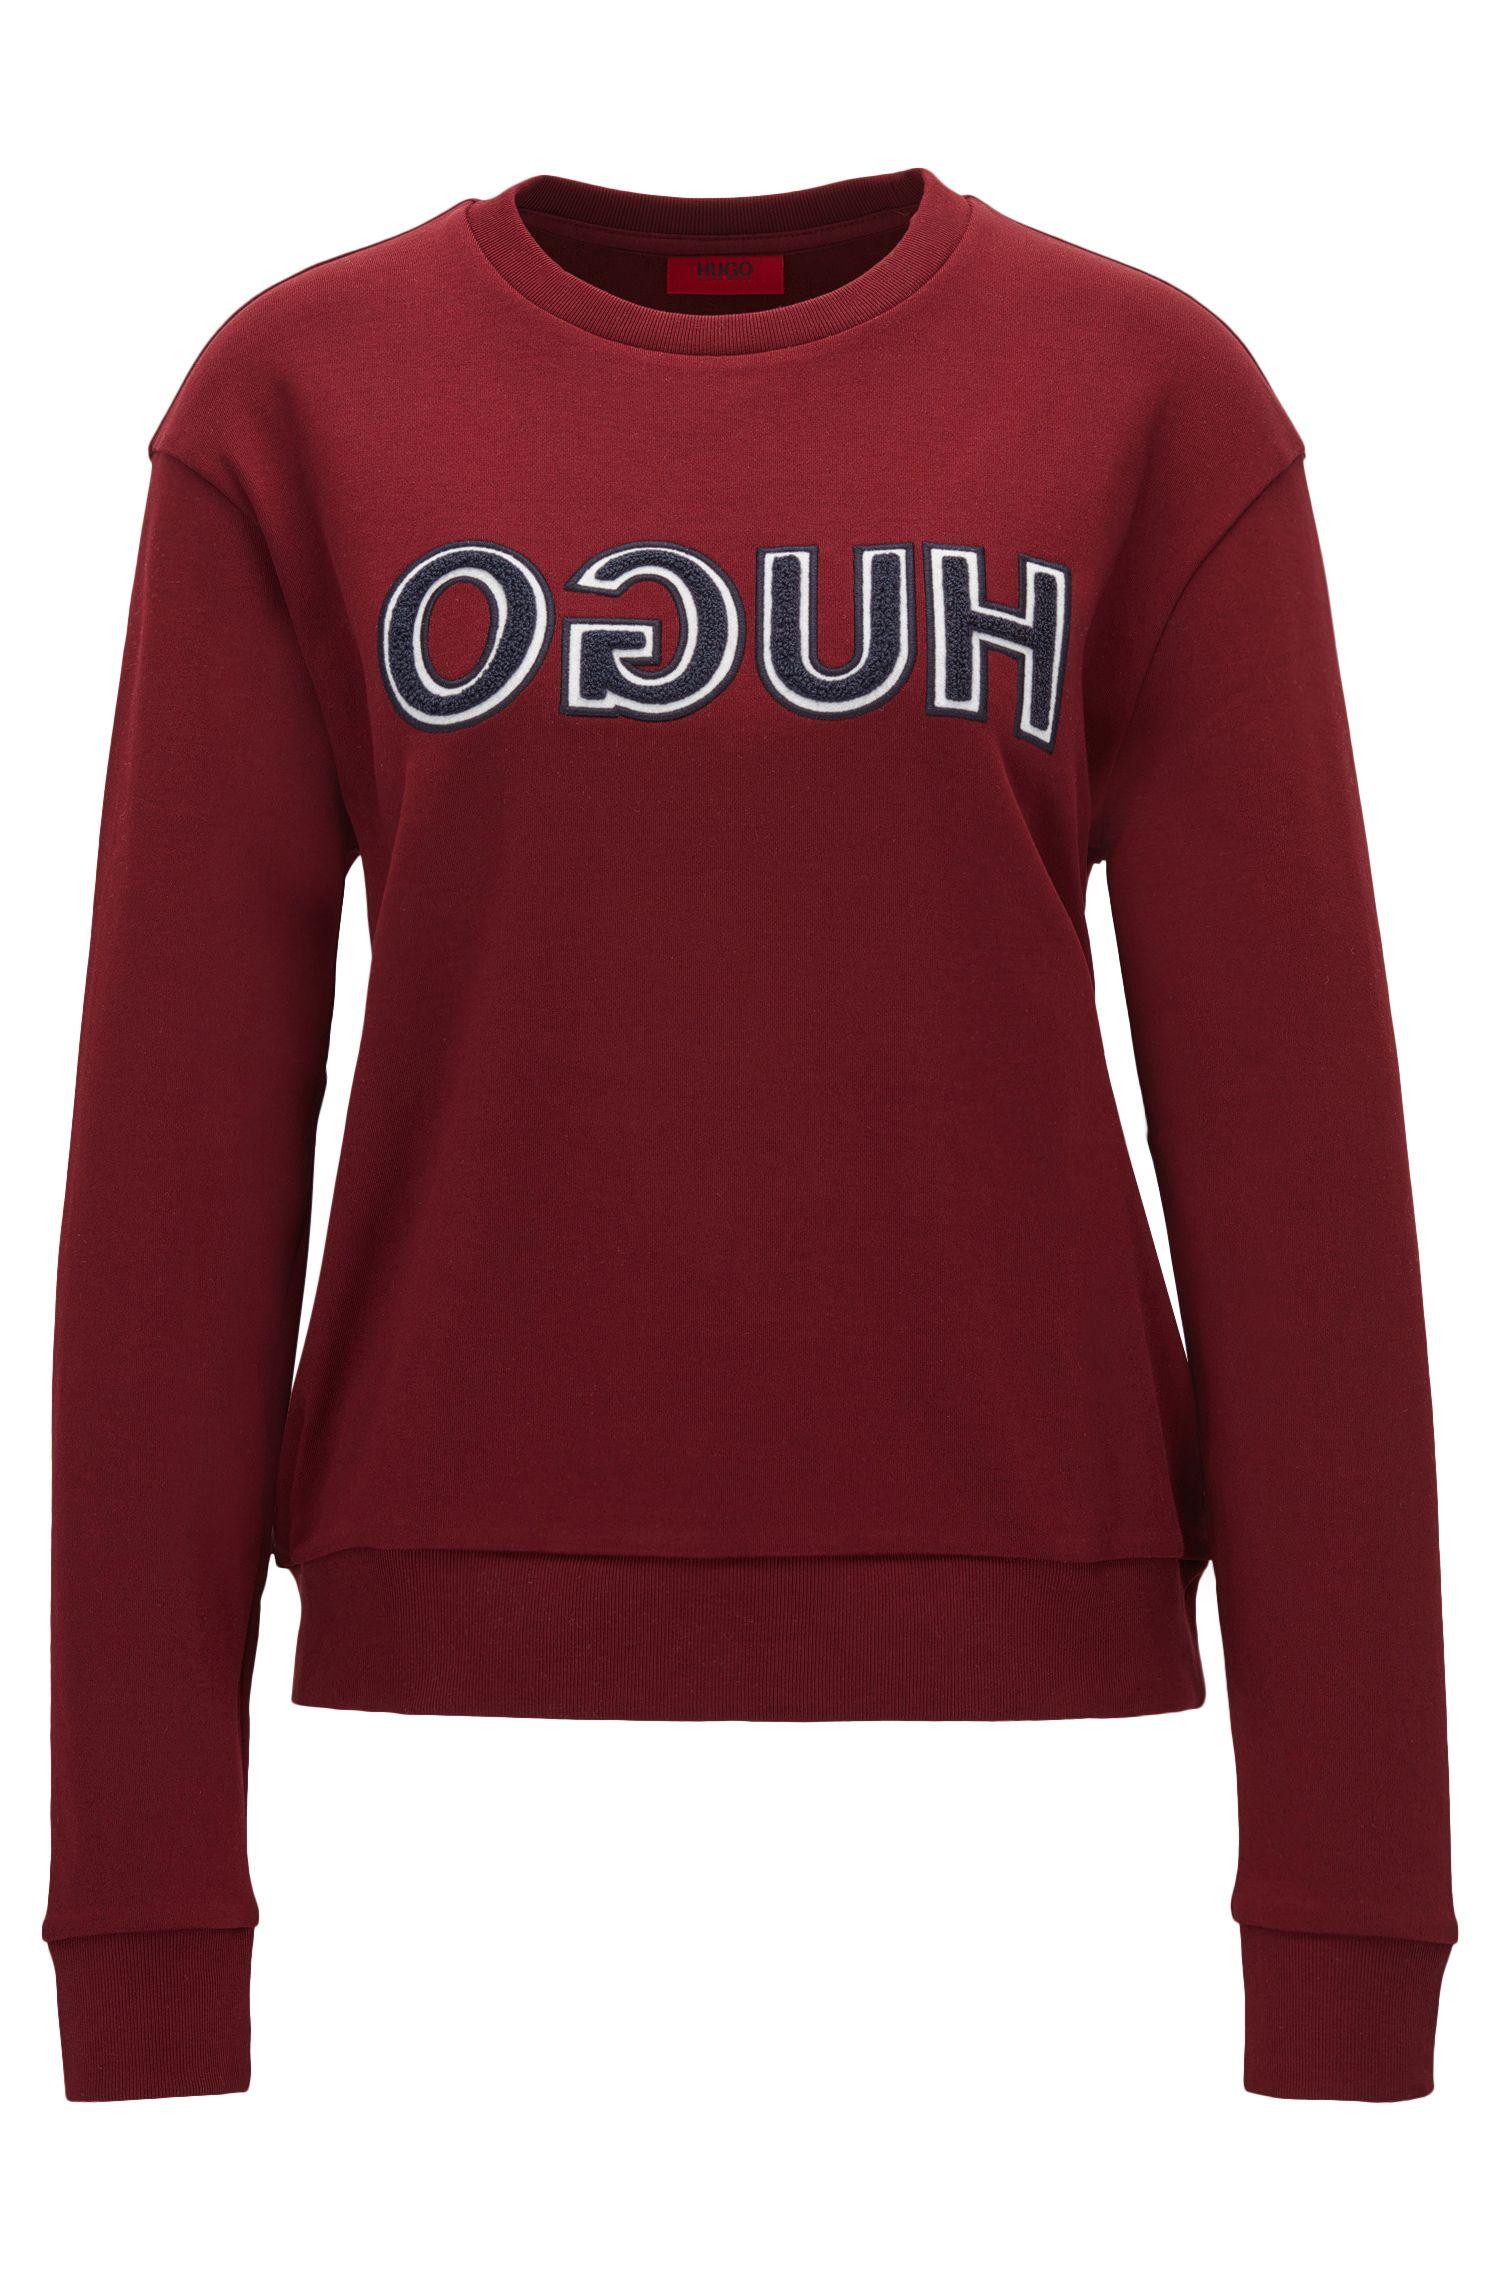 Cotton Logo Sweatershirt | Niccita